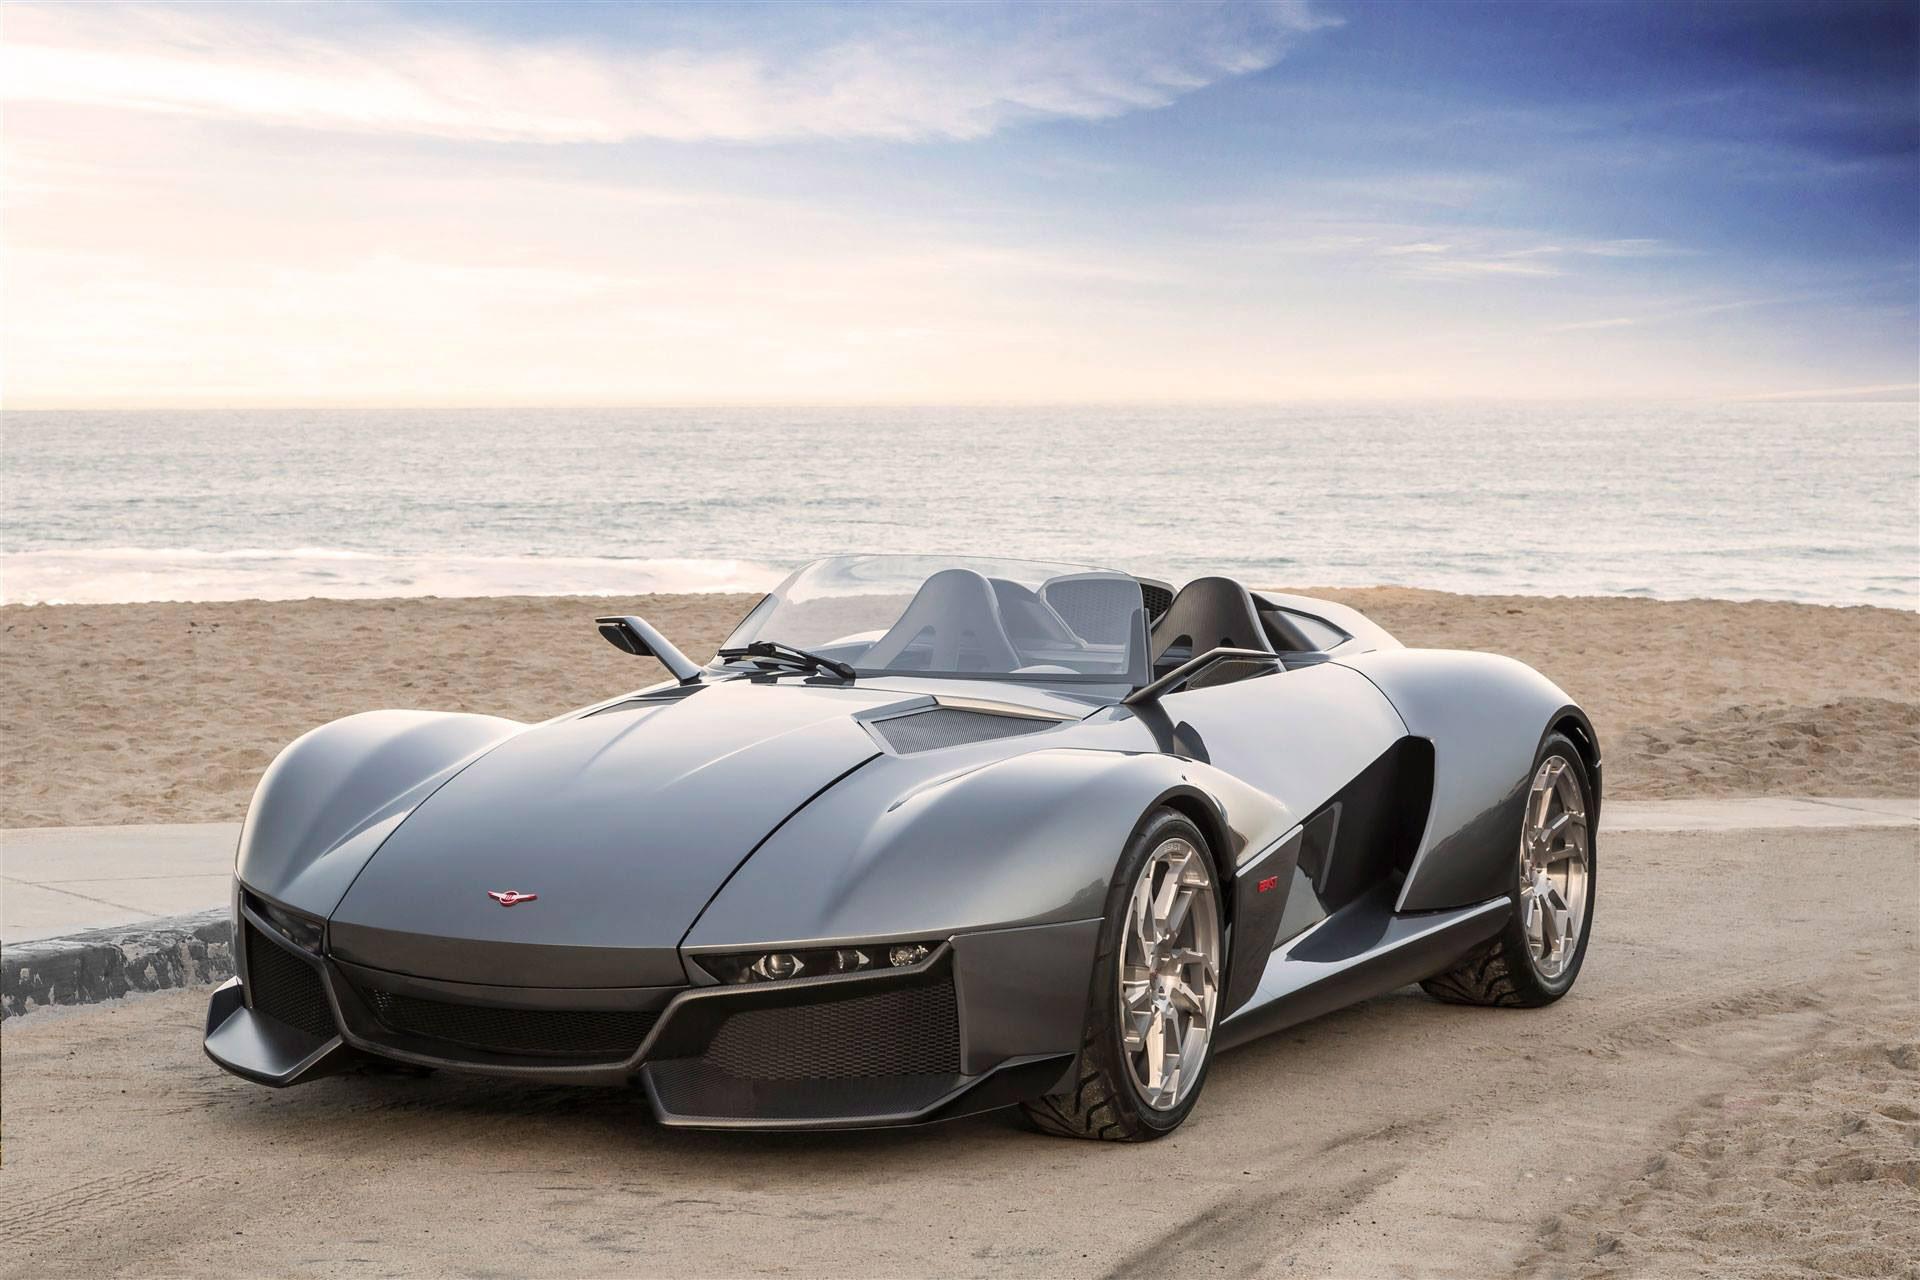 2015 Rezvani Motors Beast Supercar - Picture 122635